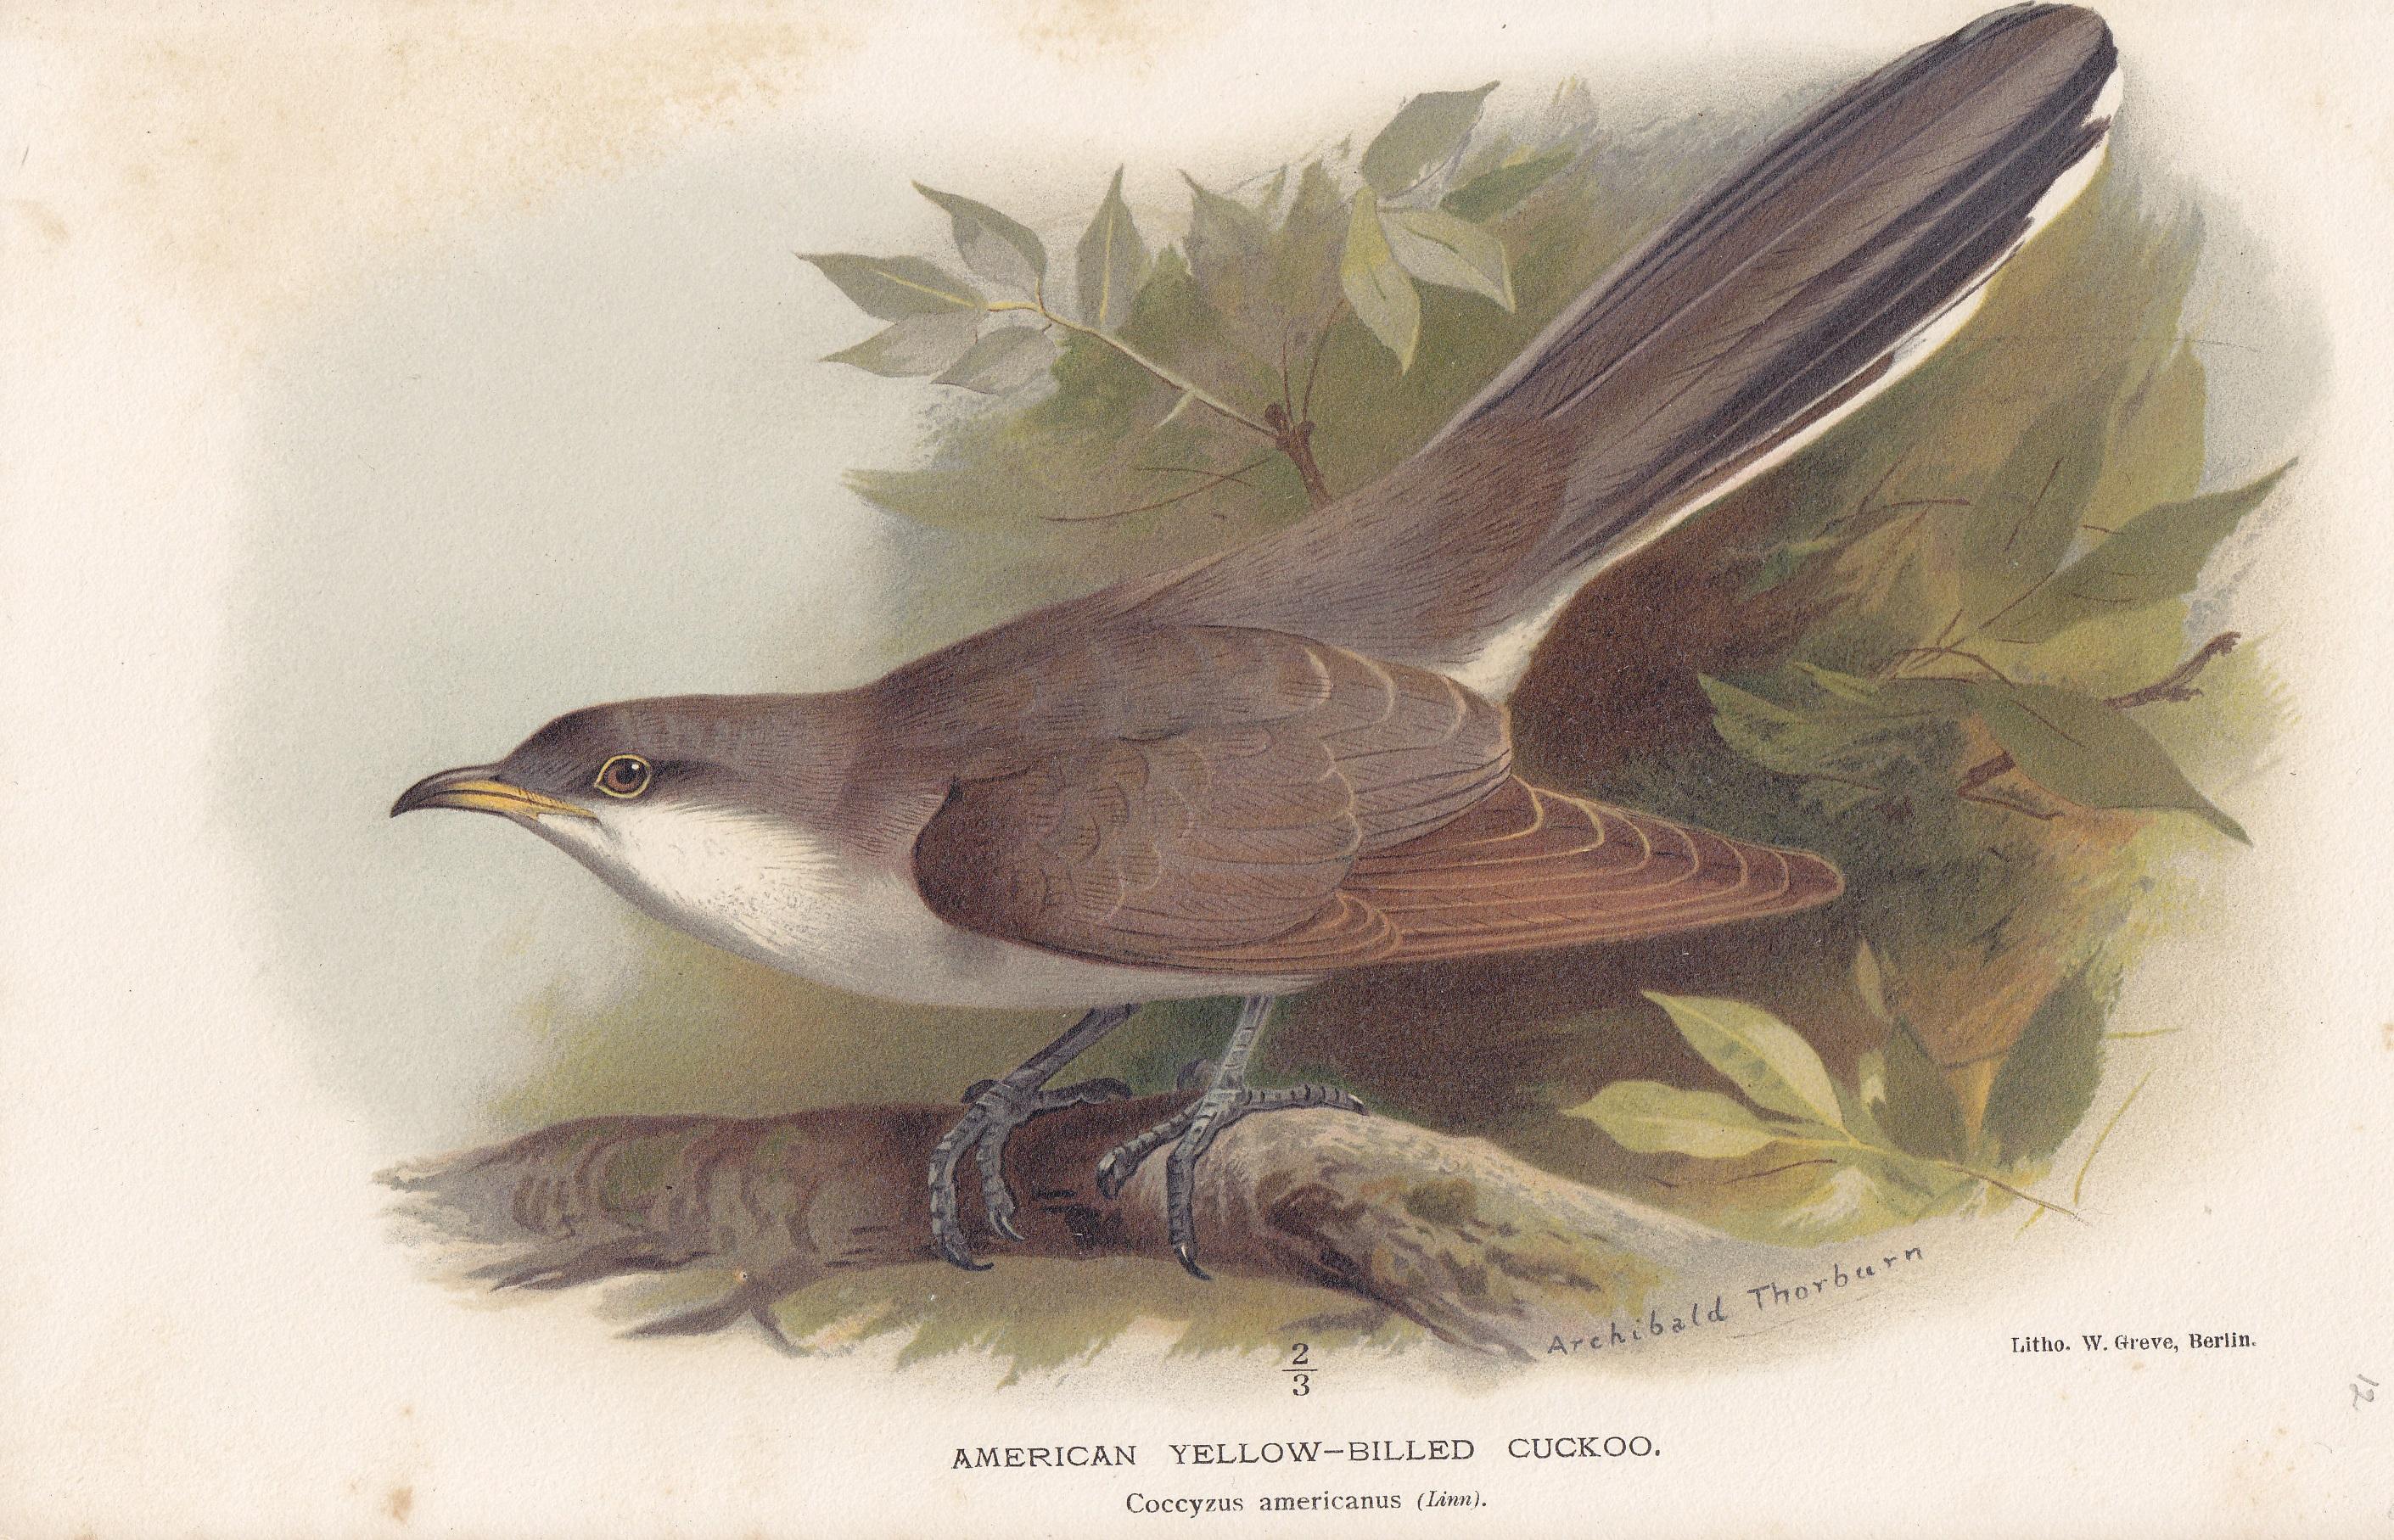 American Yellow-Billed Cuckoo